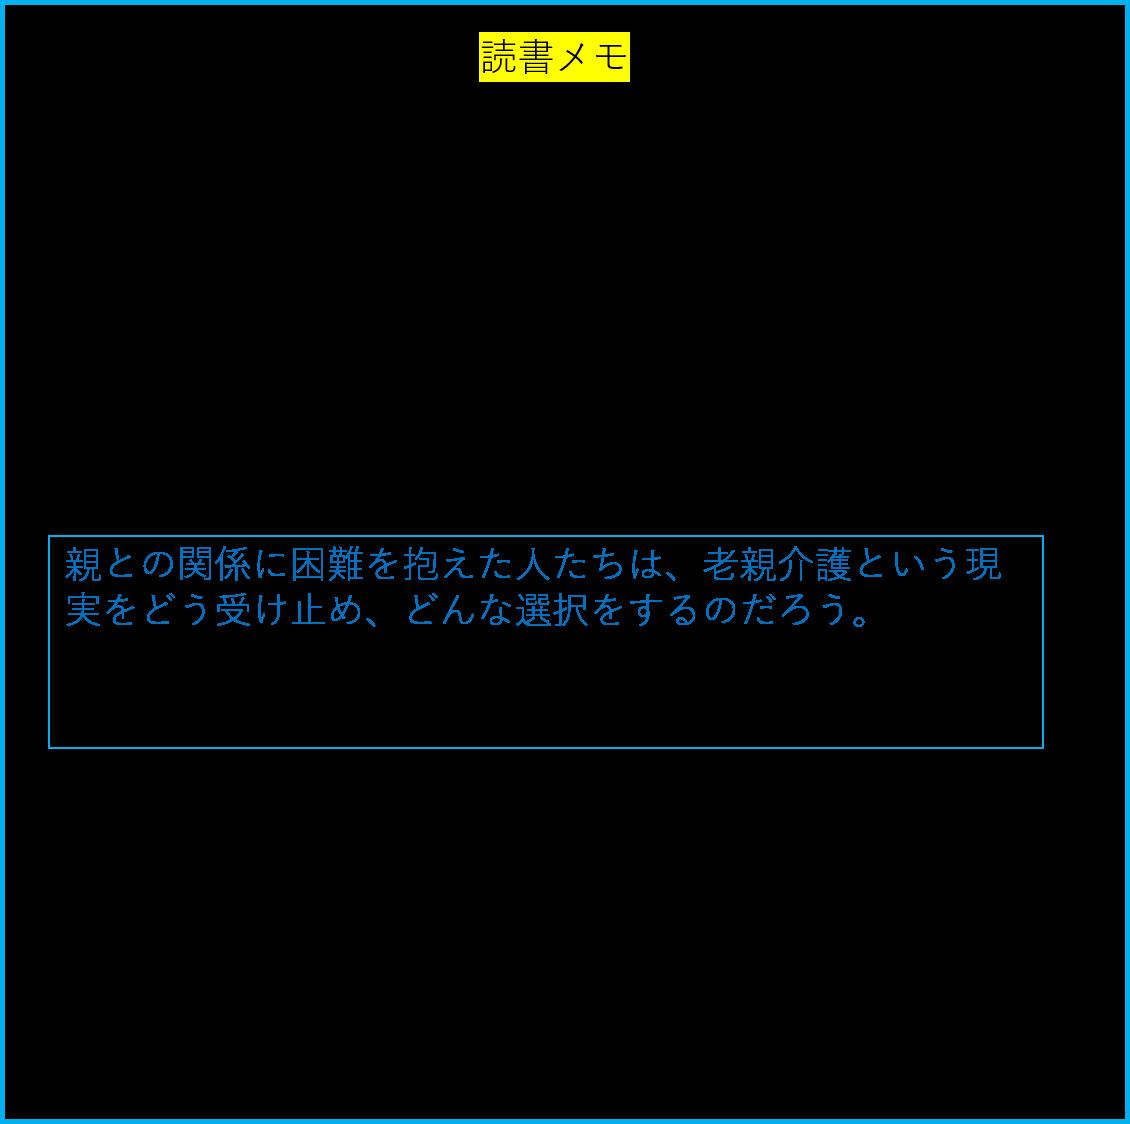 f:id:shishi-book:20200420154101p:plain